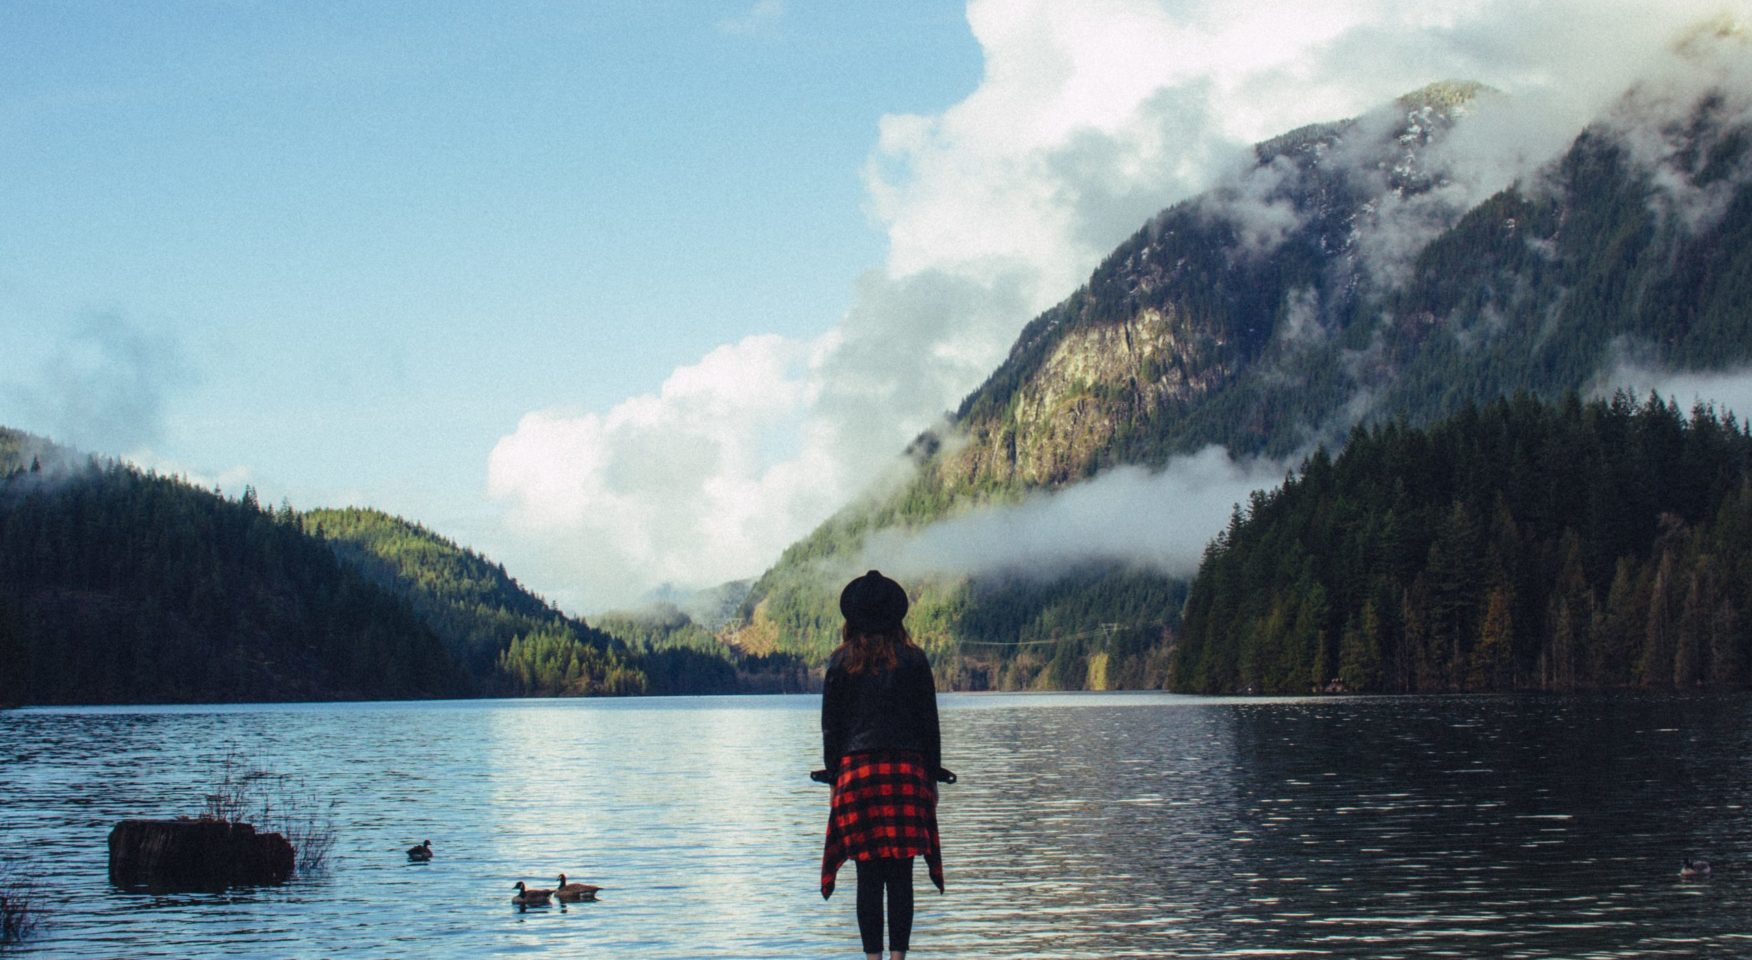 girl-plaid-gazing-water-mountains